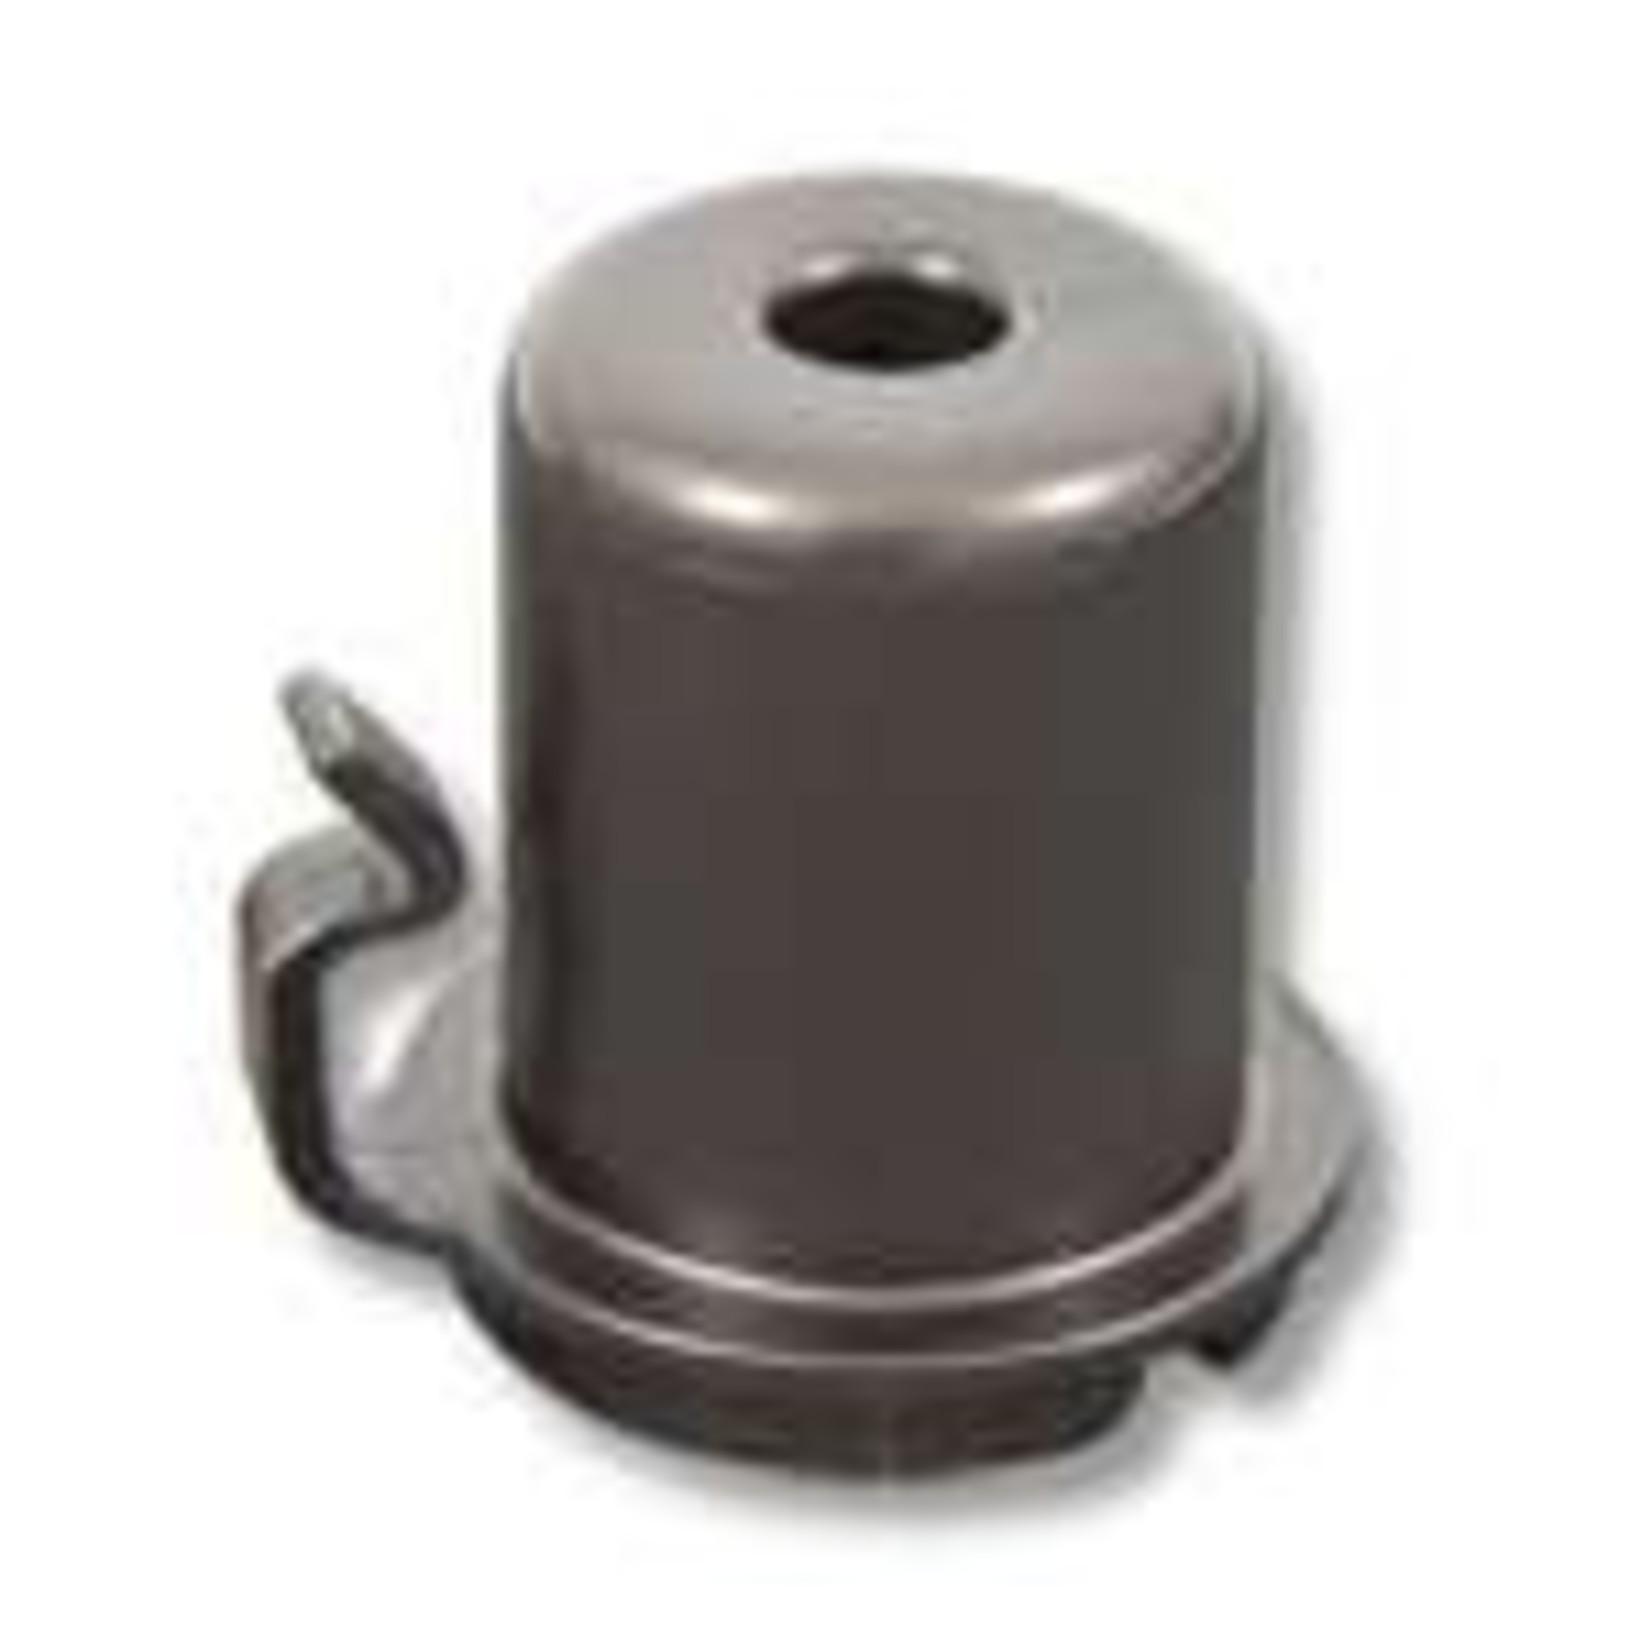 Dyson Dyson DC24 Tool Holder, Clip